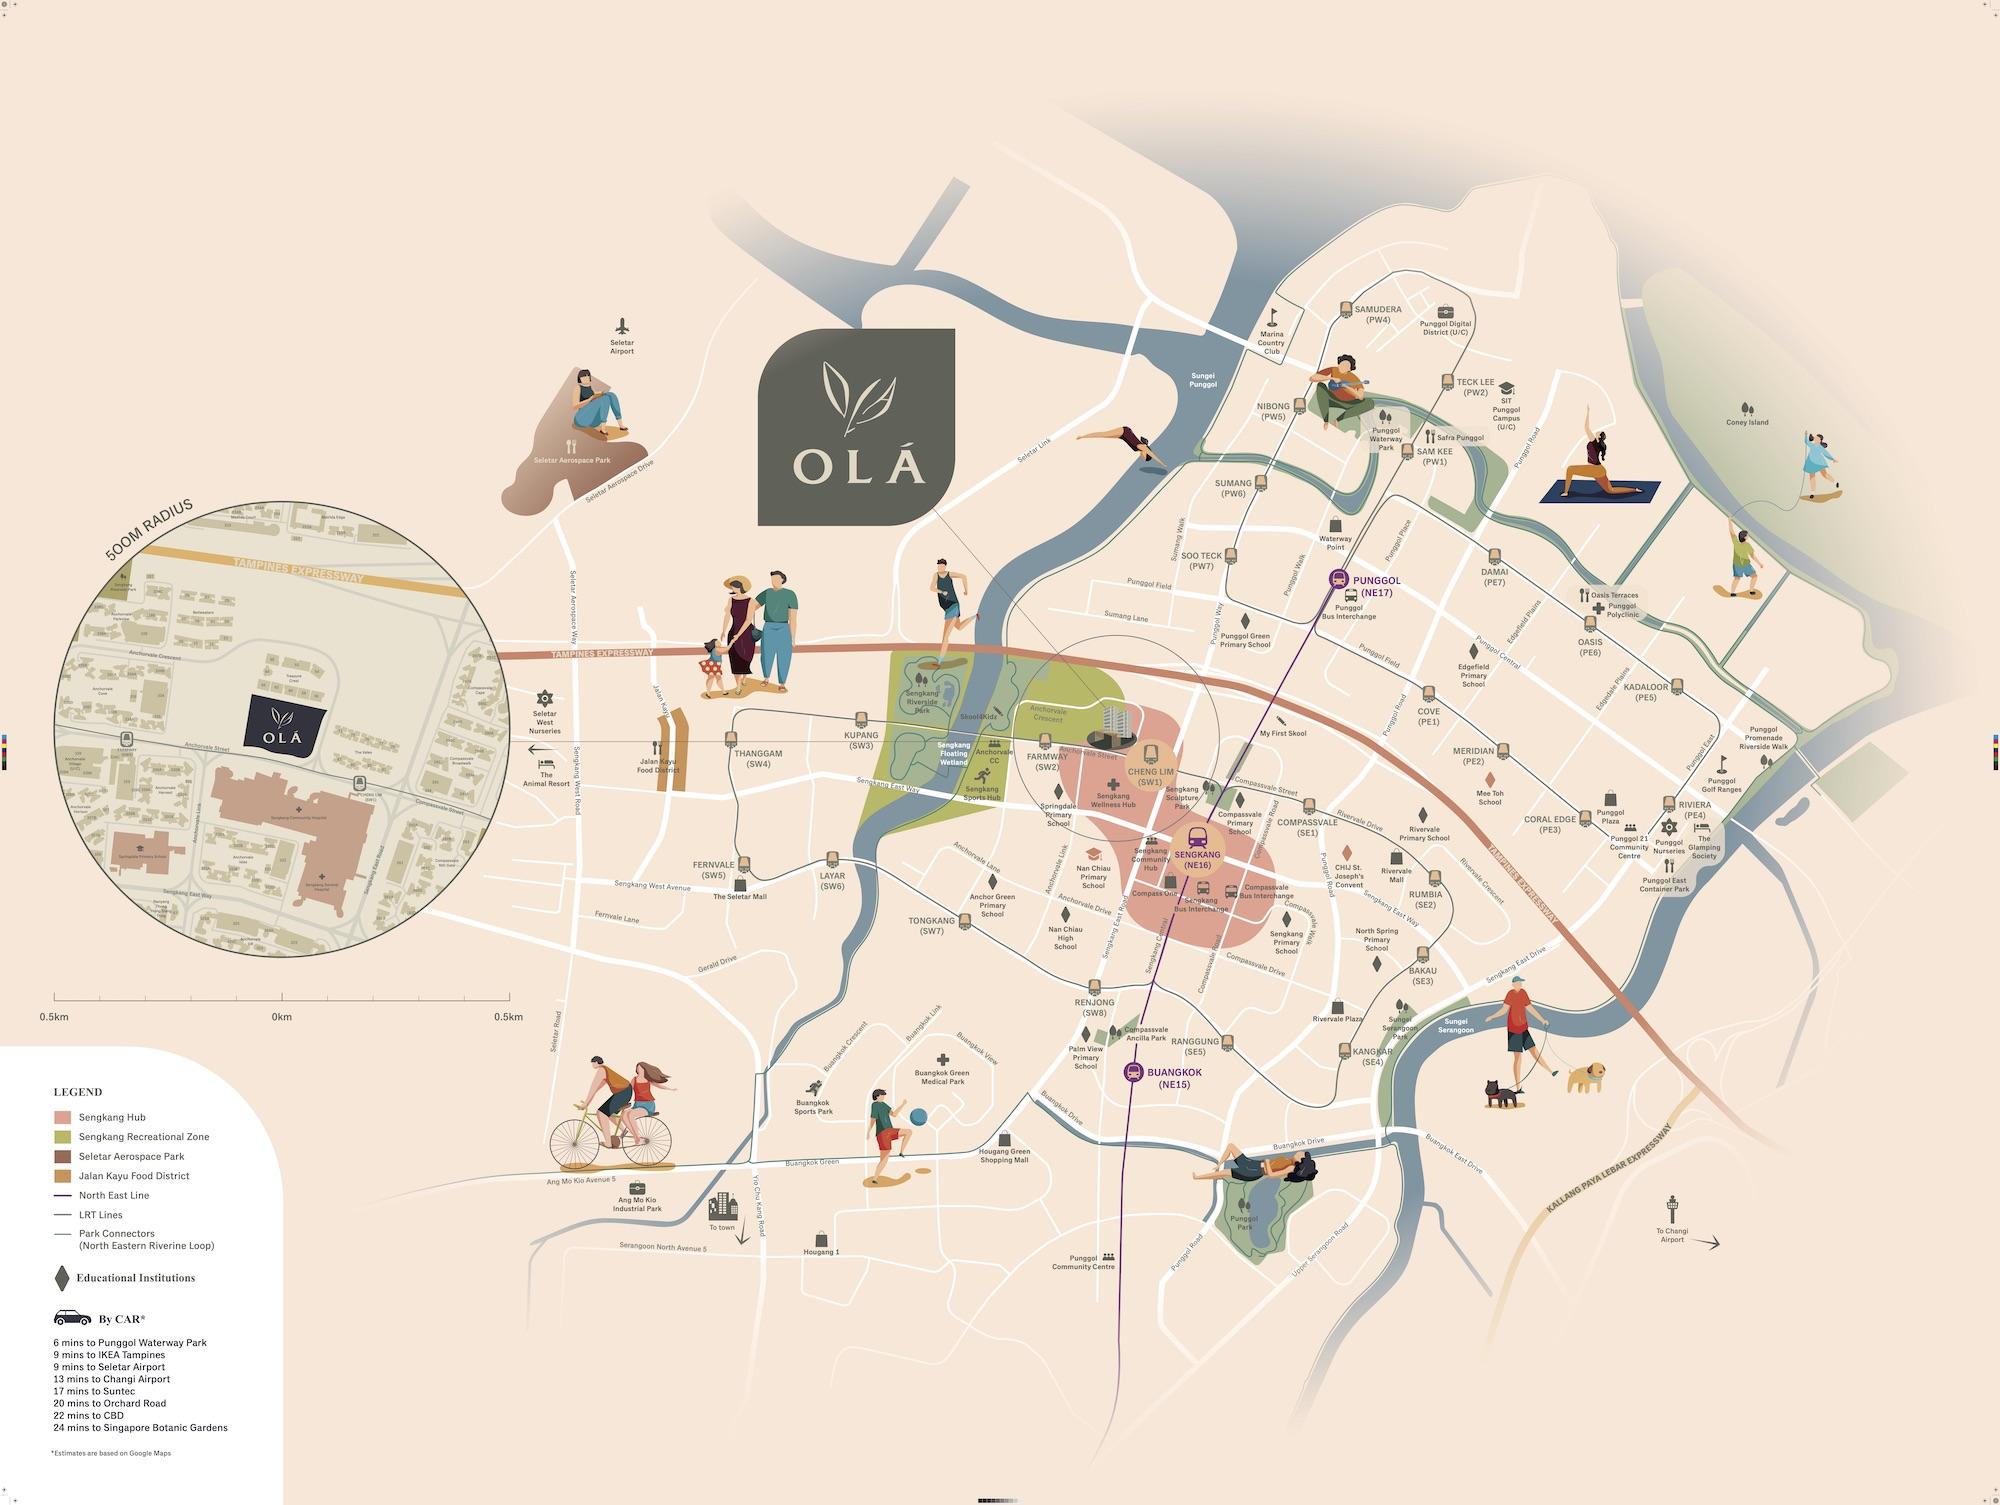 Ola-new-condo-singapore-location-map